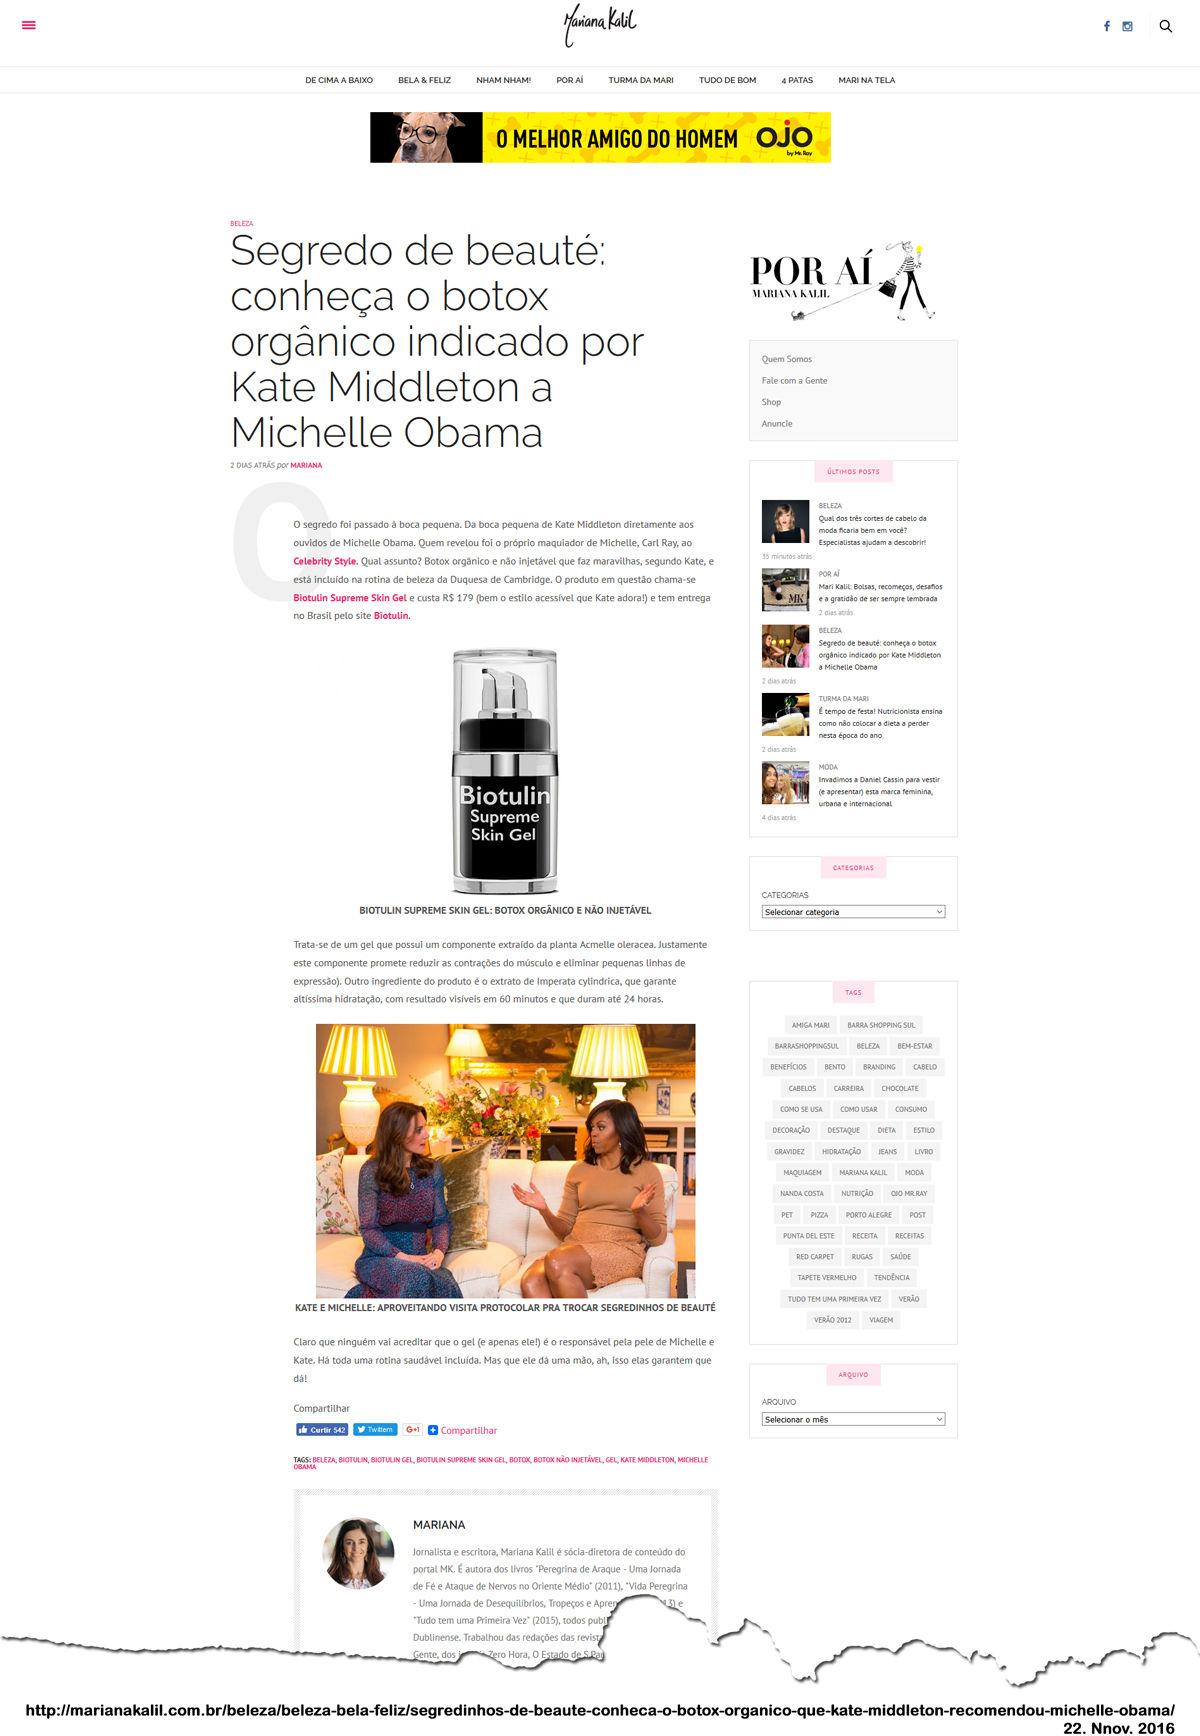 http://marianakalil.com.br/beleza/beleza-bela-feliz/segredinhos-de-beaute-conheca-o-botox-organico-que-kate-middleton-recomendou-michelle-obama/